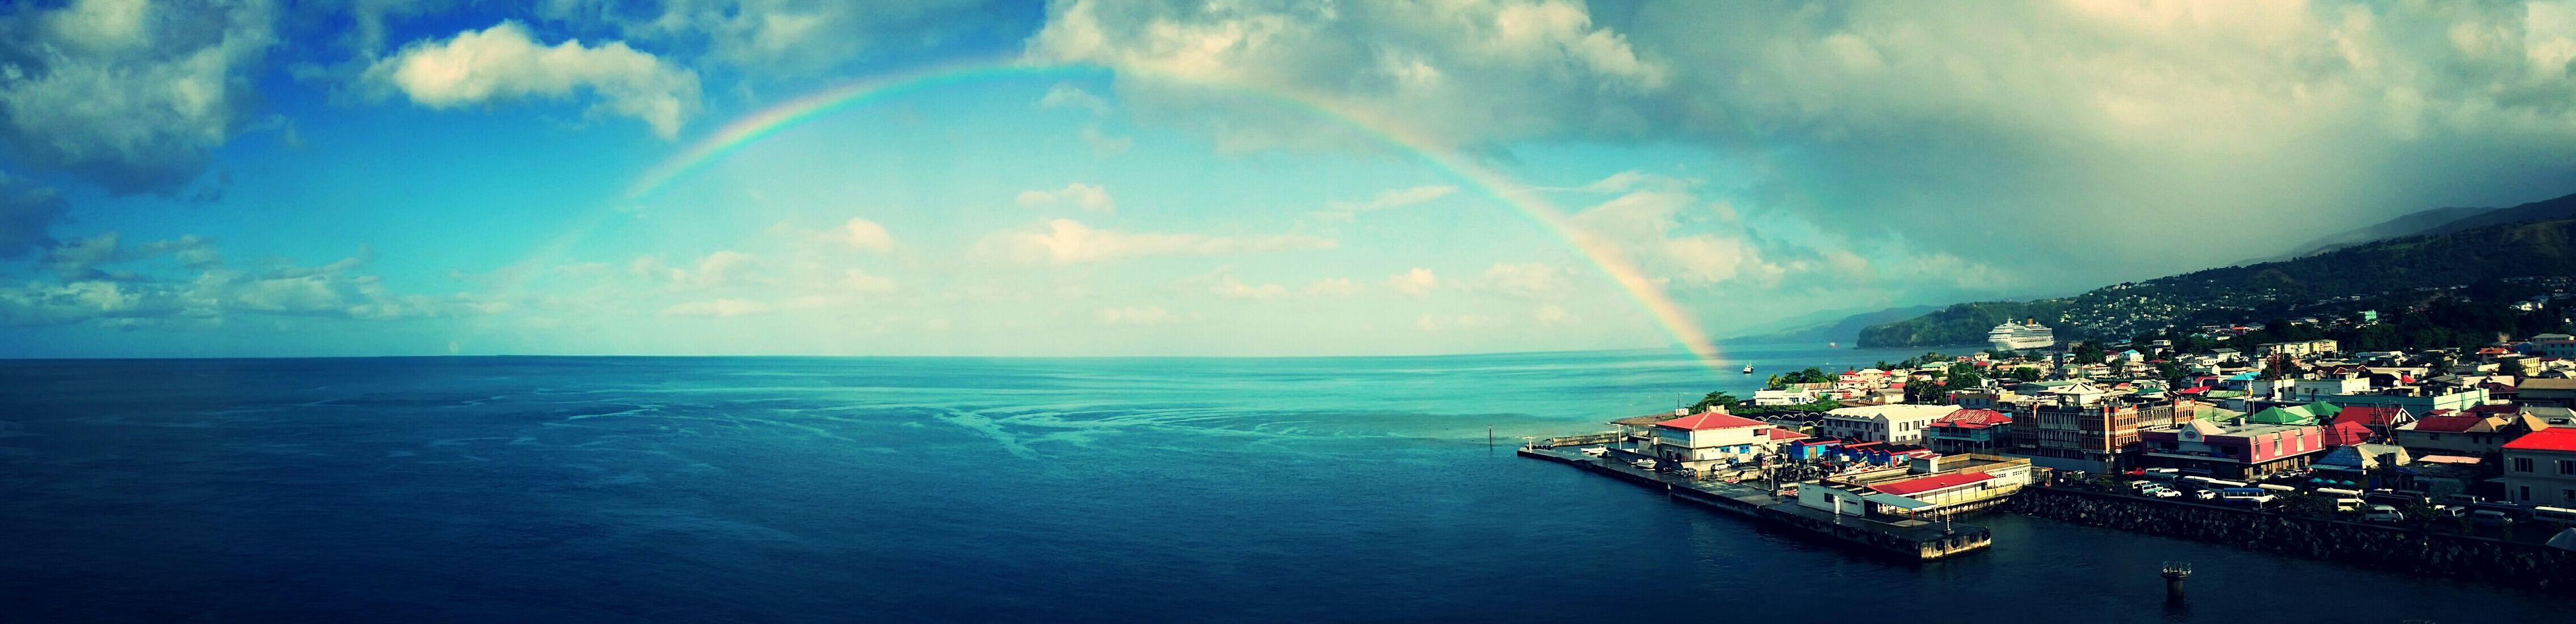 sea, water, horizon over water, sky, cloud - sky, scenics, beauty in nature, tranquil scene, blue, high angle view, tranquility, nature, waterfront, cloud, cloudy, beach, idyllic, built structure, coastline, seascape